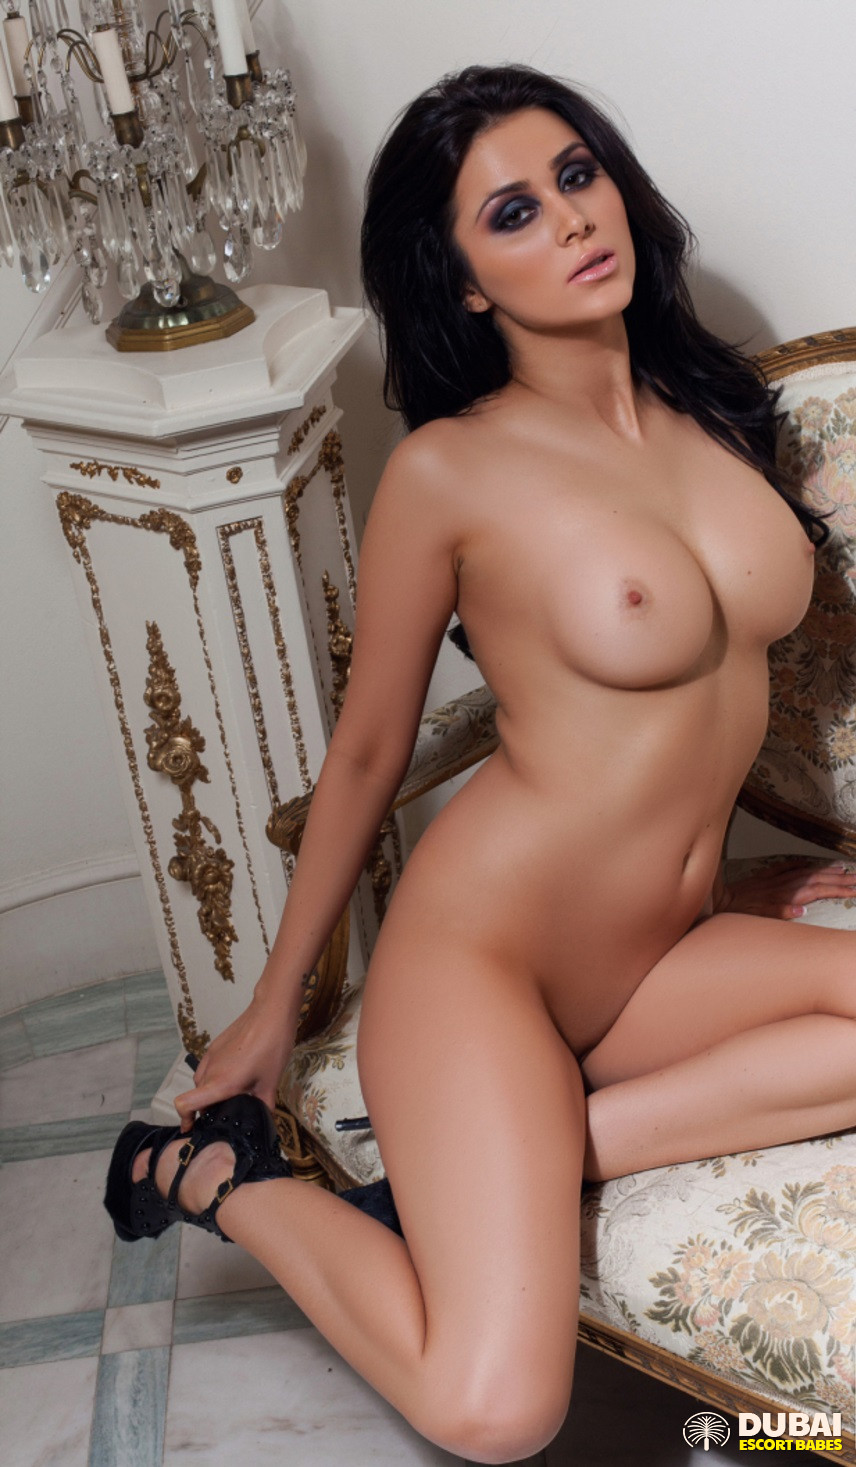 escort homosexuell anna escorte jasmine